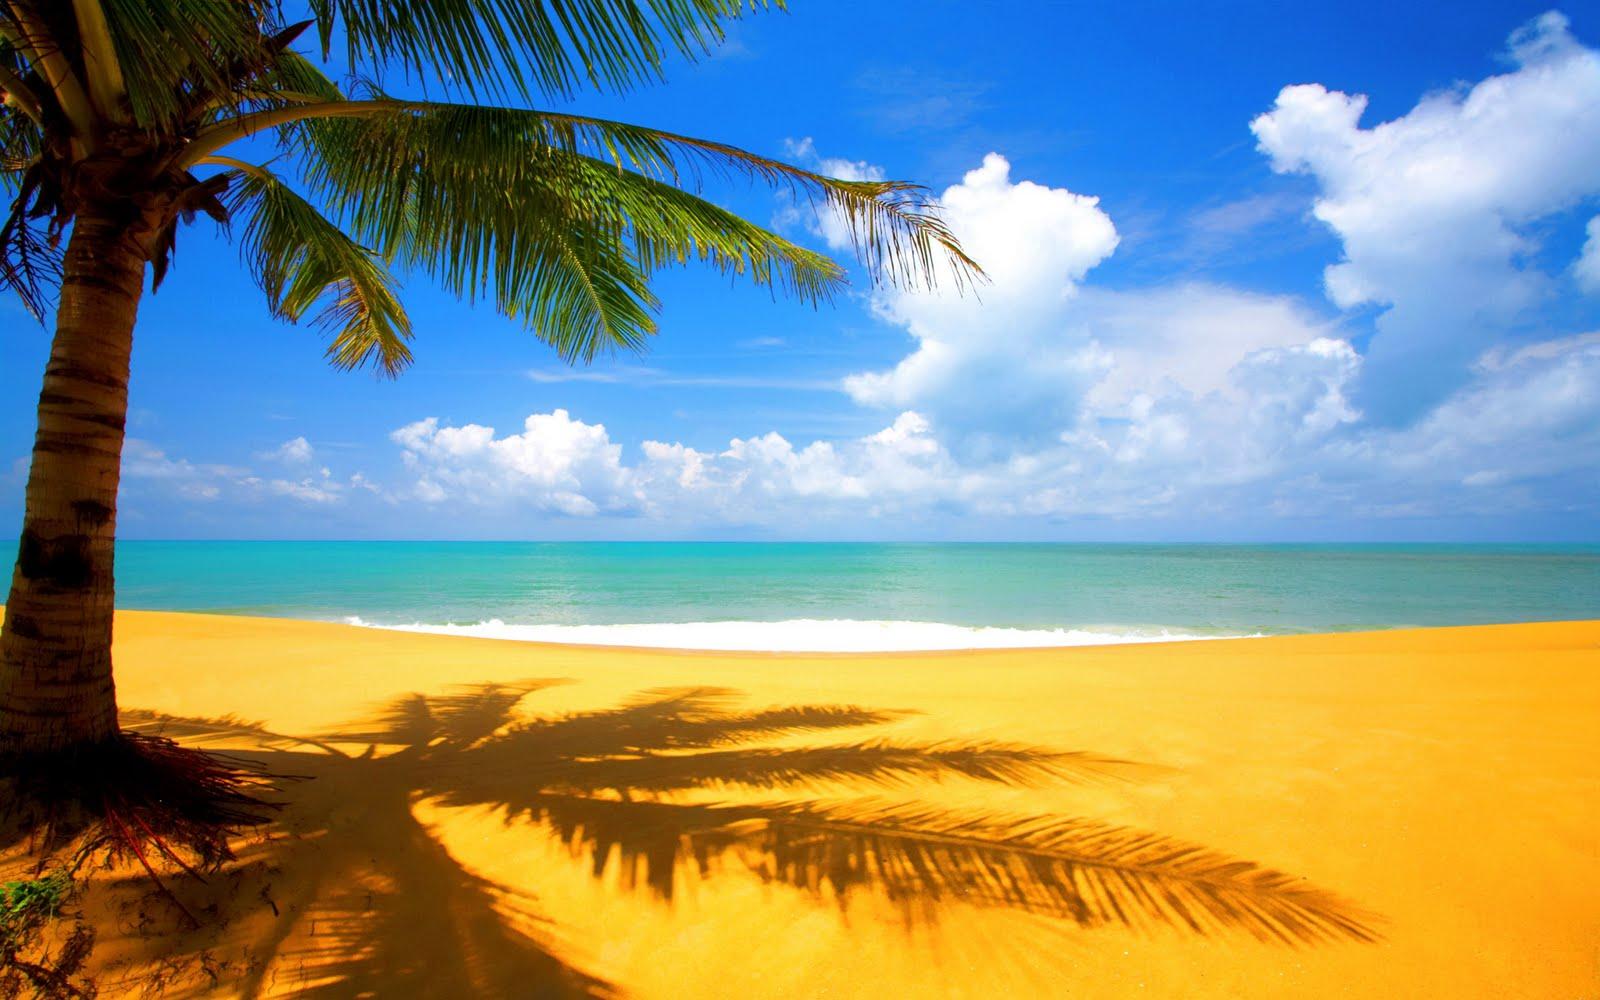 http://4.bp.blogspot.com/-W5JHS4J_7Gk/TeogdMSE_BI/AAAAAAAAAP4/Jlo1S9rKv0o/s1600/At_The_Beach_Hd_Wallpaper_1920X1200.jpg